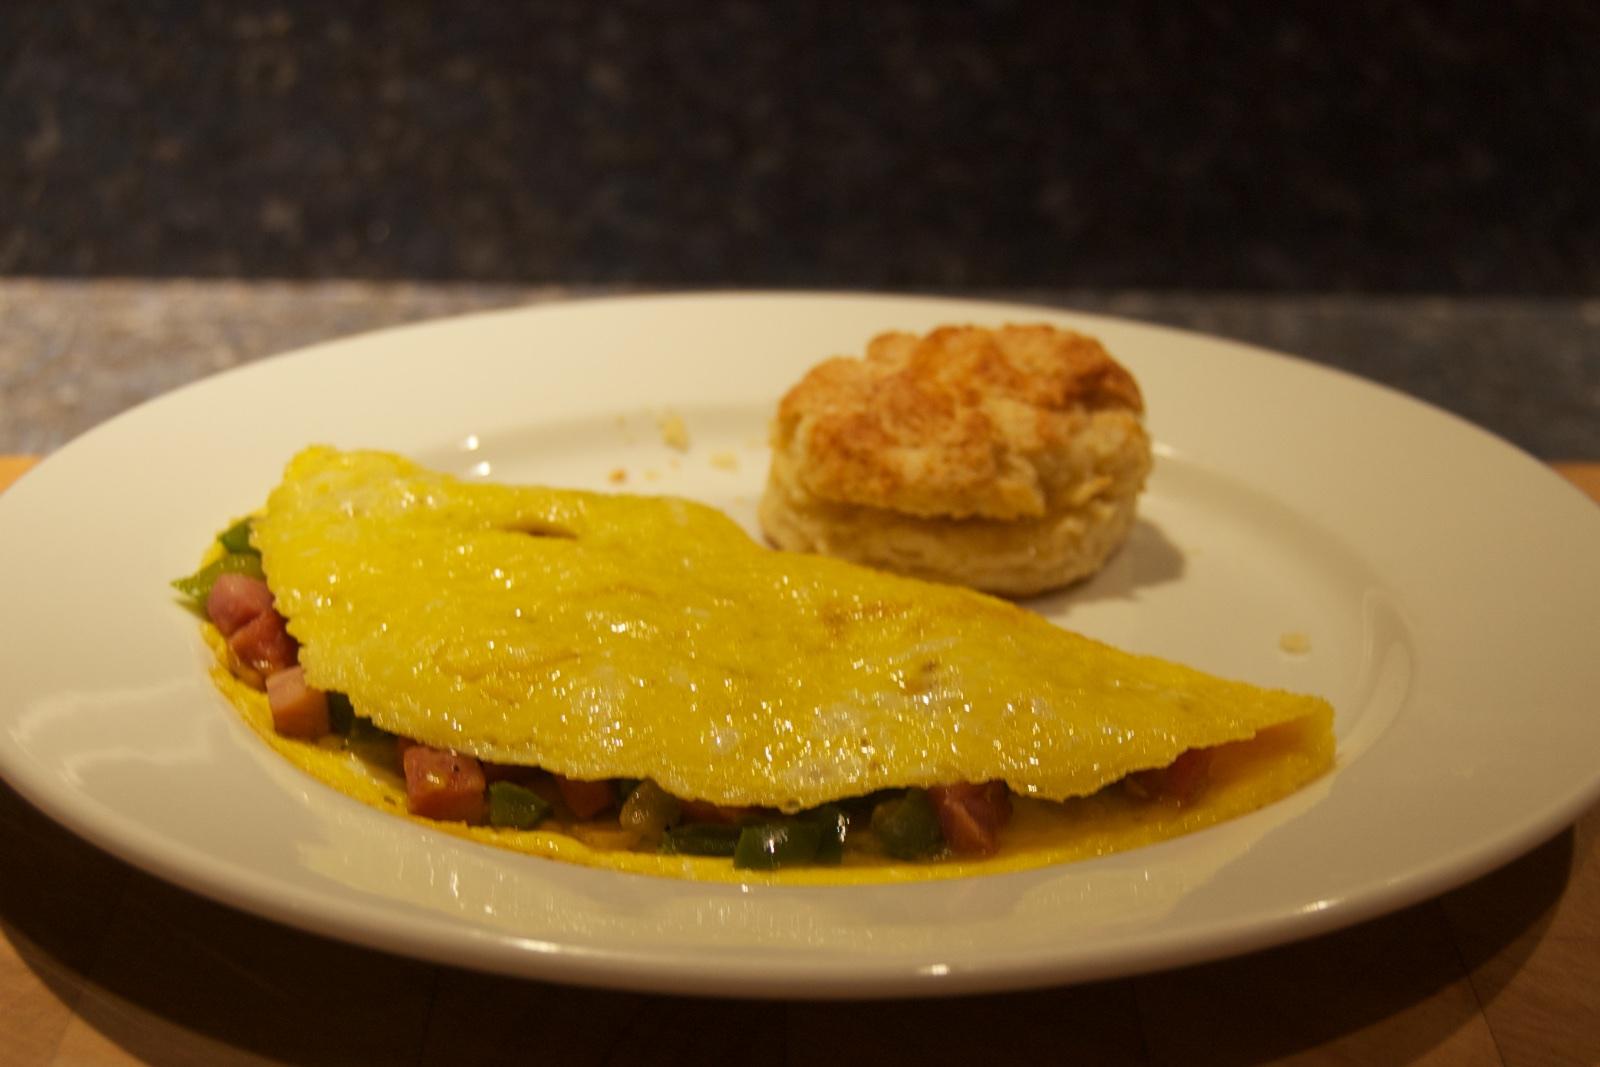 http://blog.rickk.com/food/2015/01/14/ate.2015.01.13.b.jpg